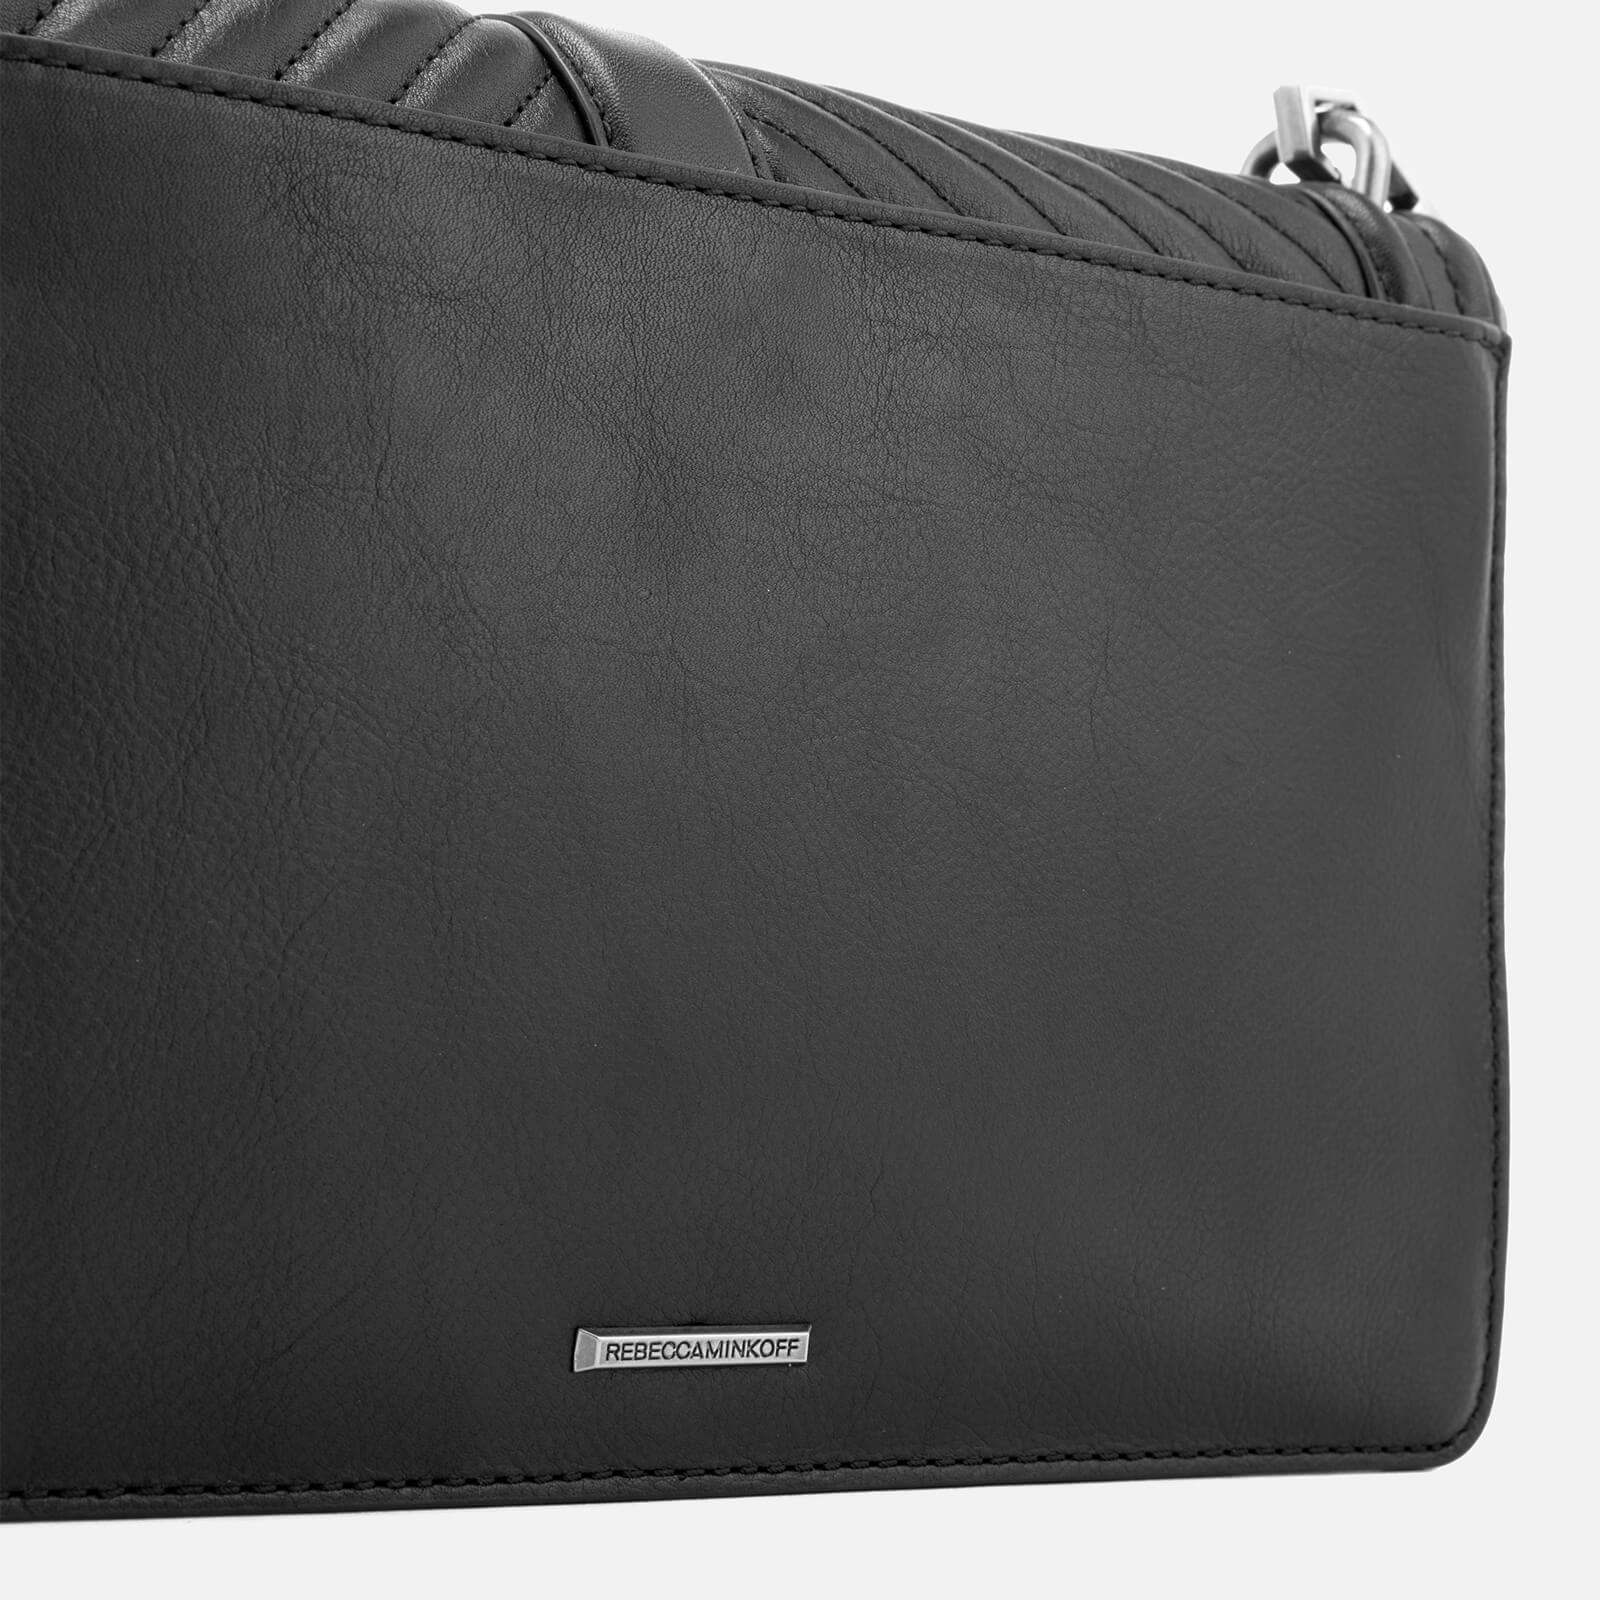 Rebecca Minkoff Leather Chevron Quilted Slim Love Cross Body Bag in Black